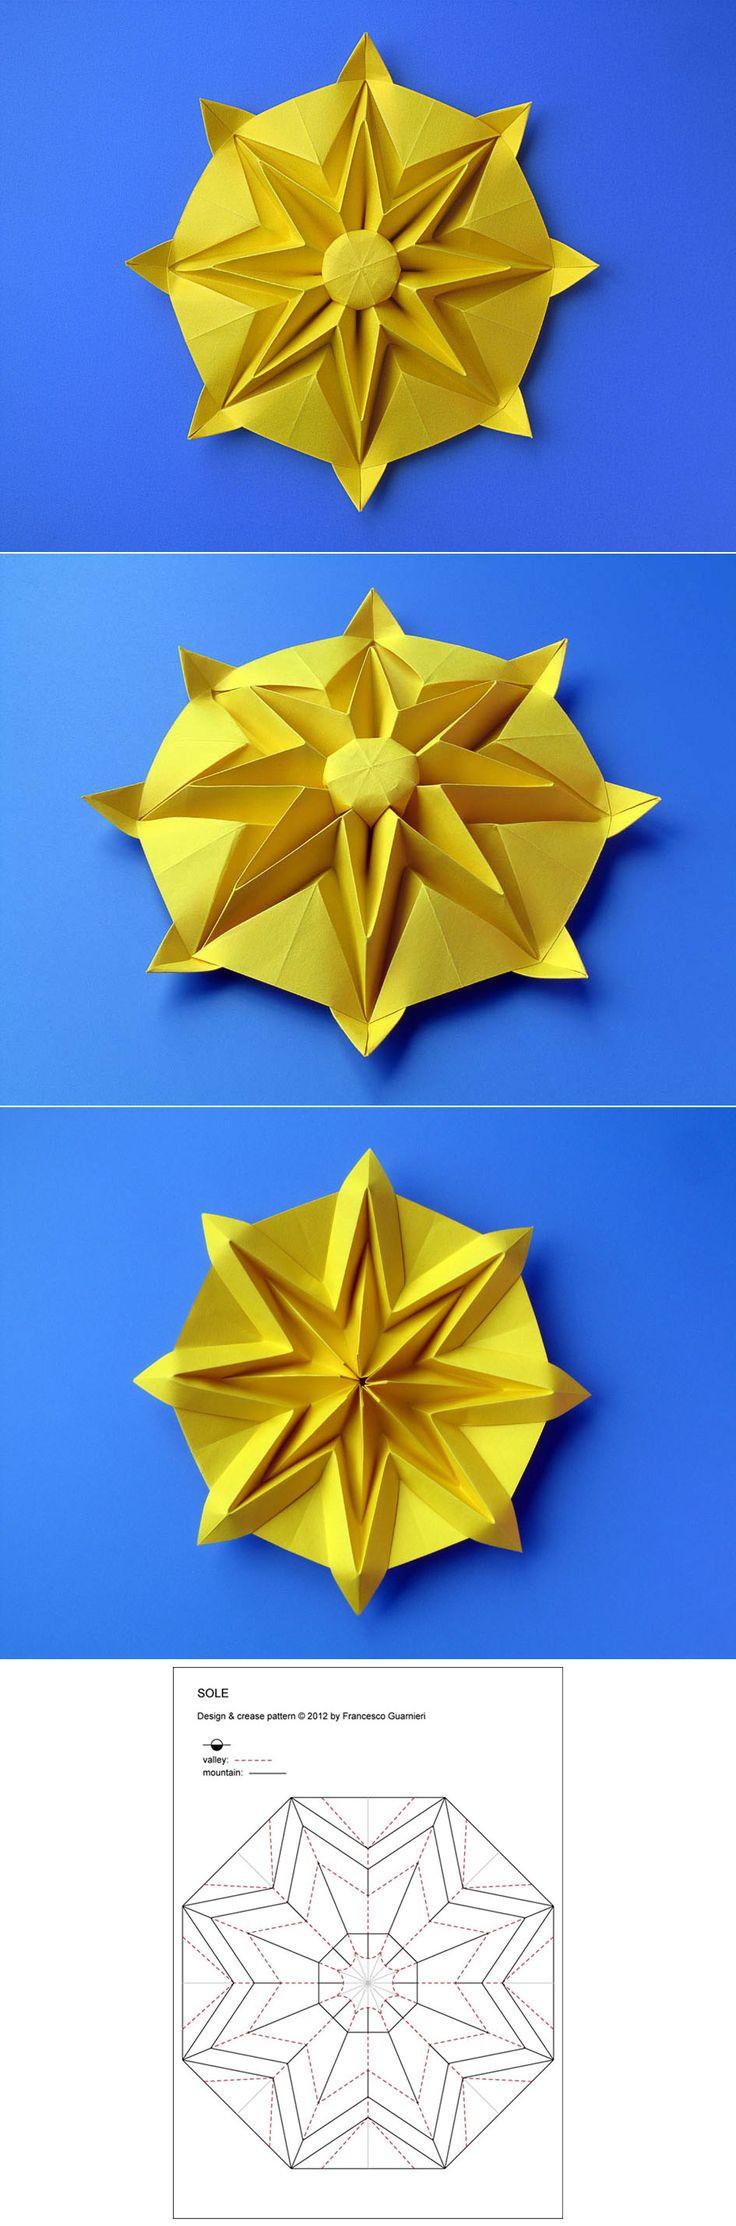 Origami: Sole – Sun, from an octagon from a sheet of paper, 24 x 24 cm. Designed and folded by Francesco Guarnieri, August 2012. Crease Pattern: http://guarnieri-origami.blogspot.it/2013/12/sole-sun.html Diagrams: Atti del XXXI Convegno CDO, 2013 http://www.origami-cdo.it/cdo/magazines/attiint.htm